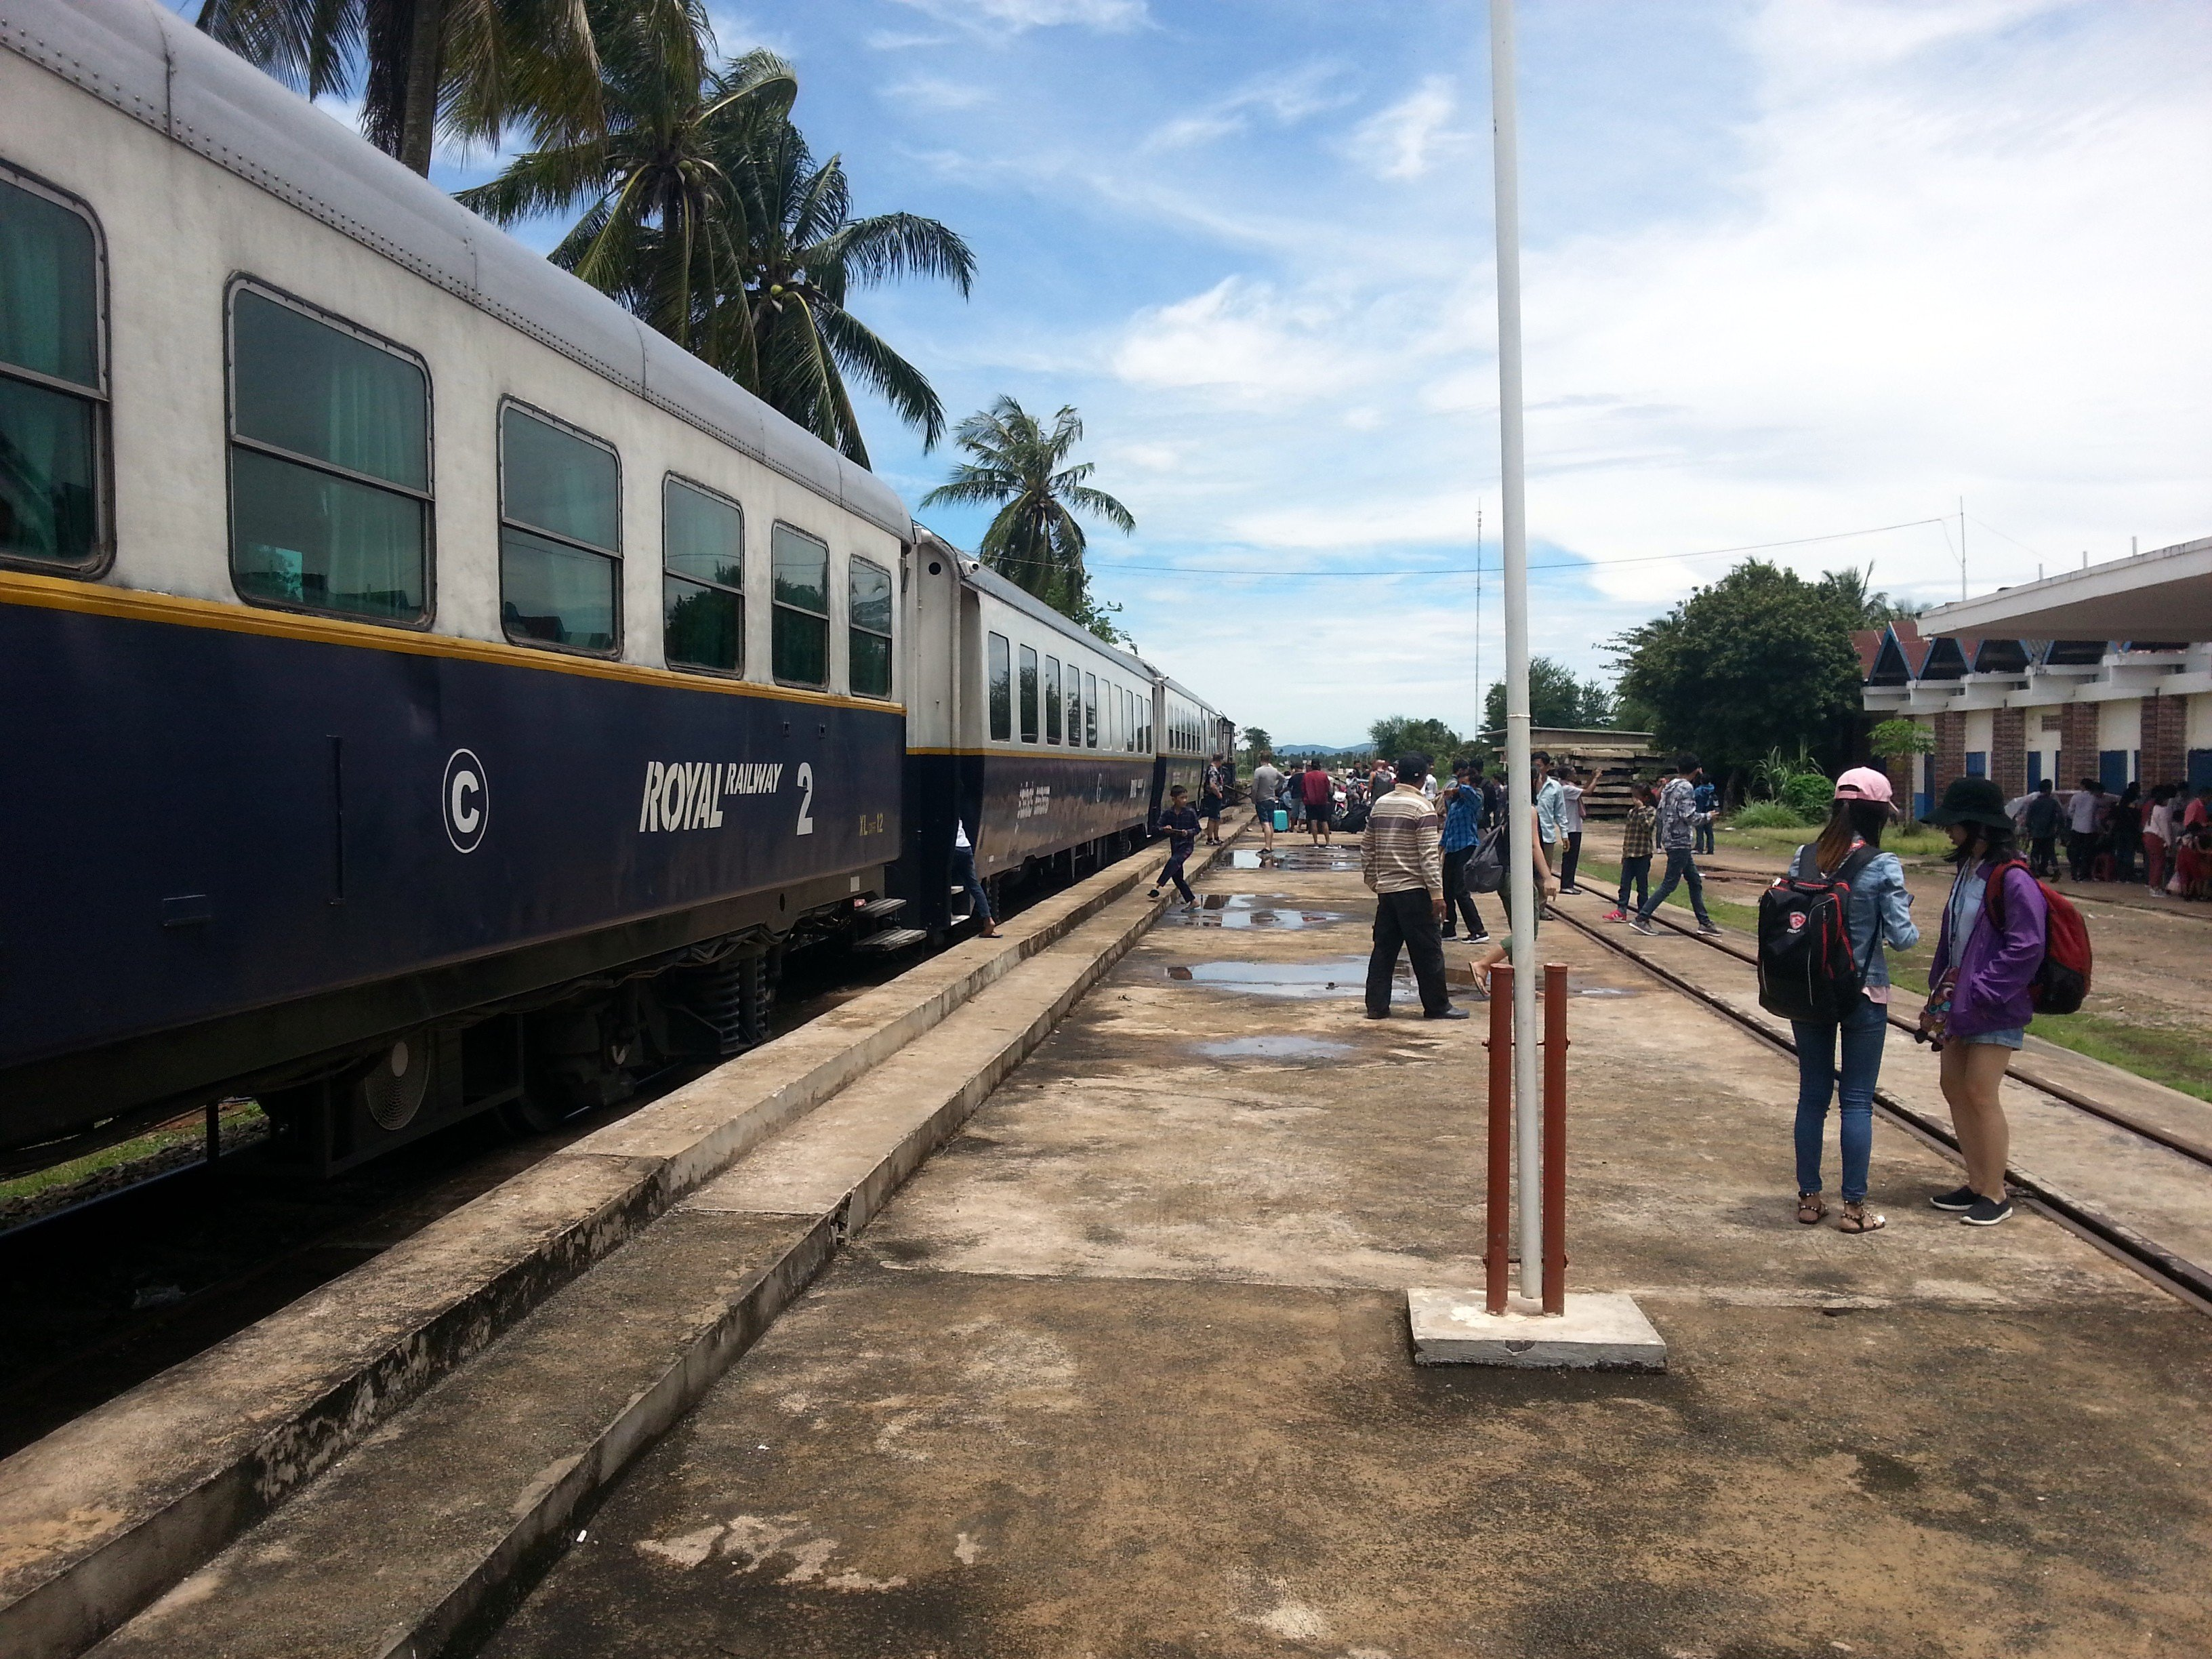 Train at Kampot Railway Station